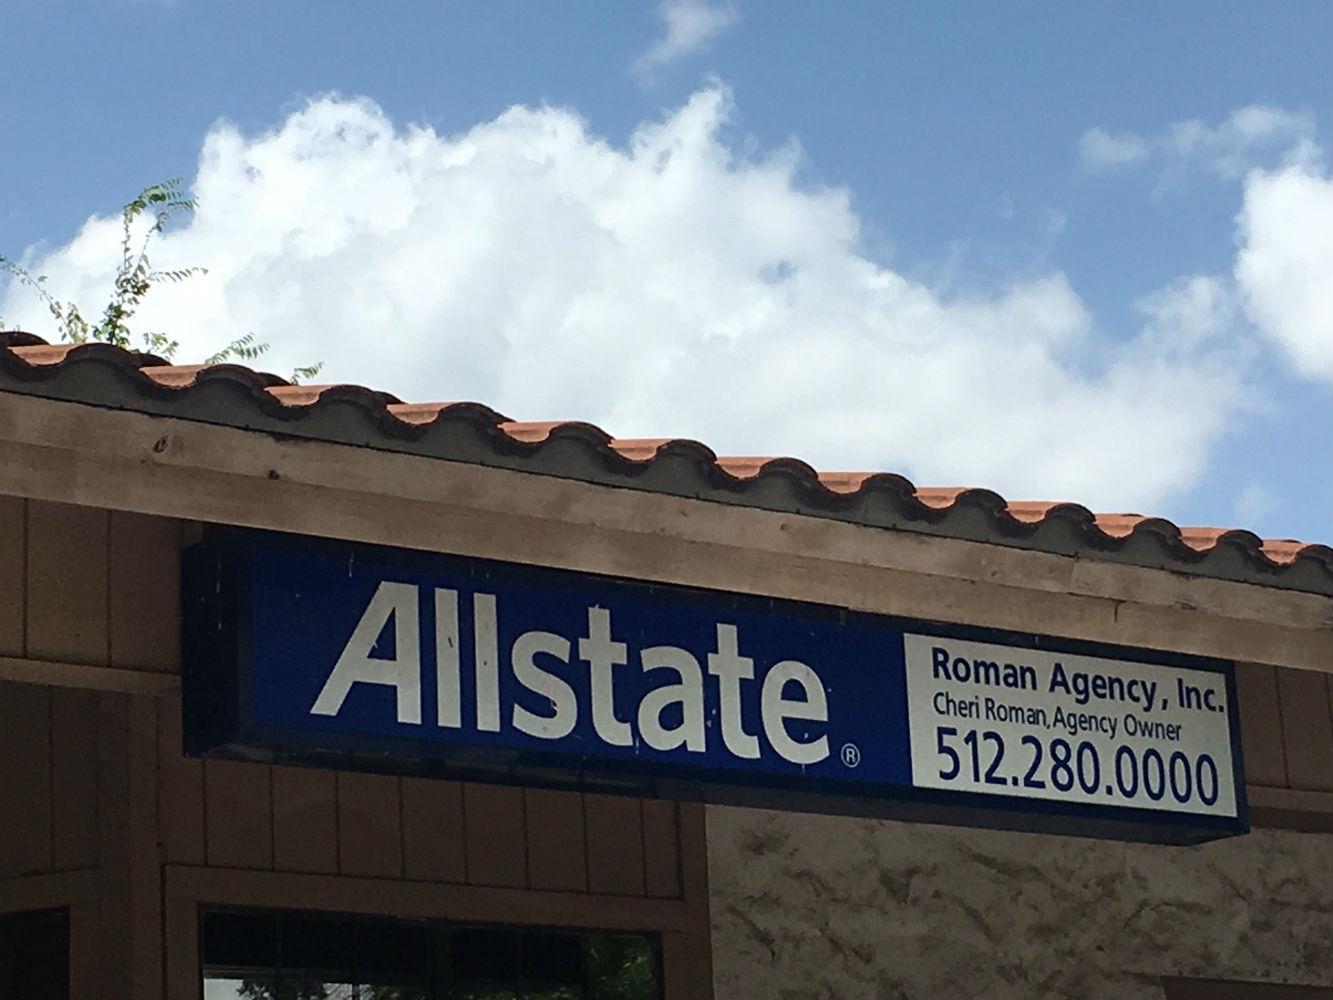 Cheri Roman: Allstate Insurance